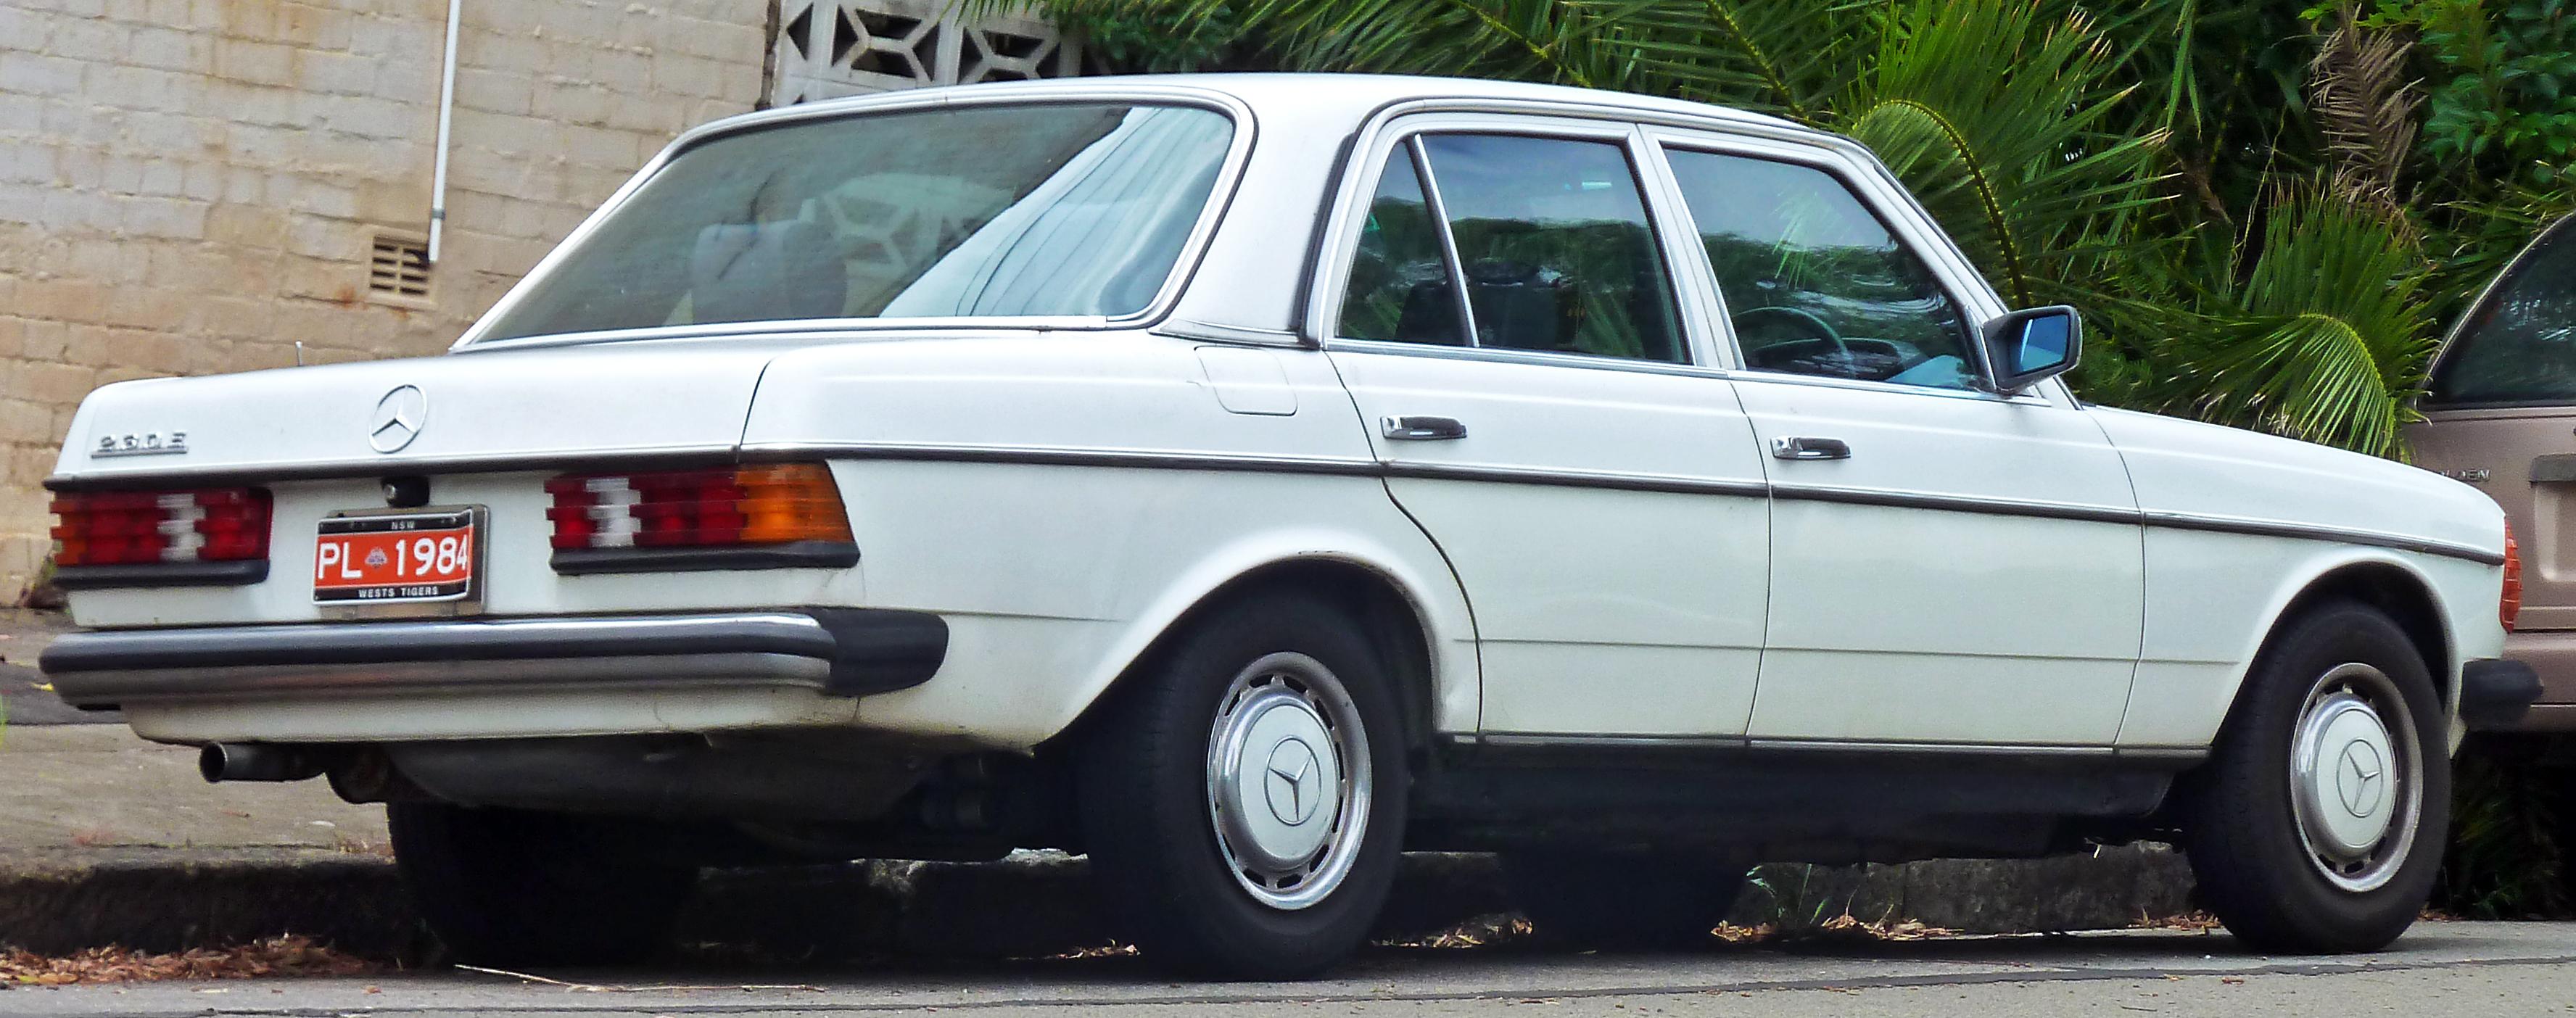 1985 Mercedes W123 E Partsopen Benz 230ce Fuel Filter Src